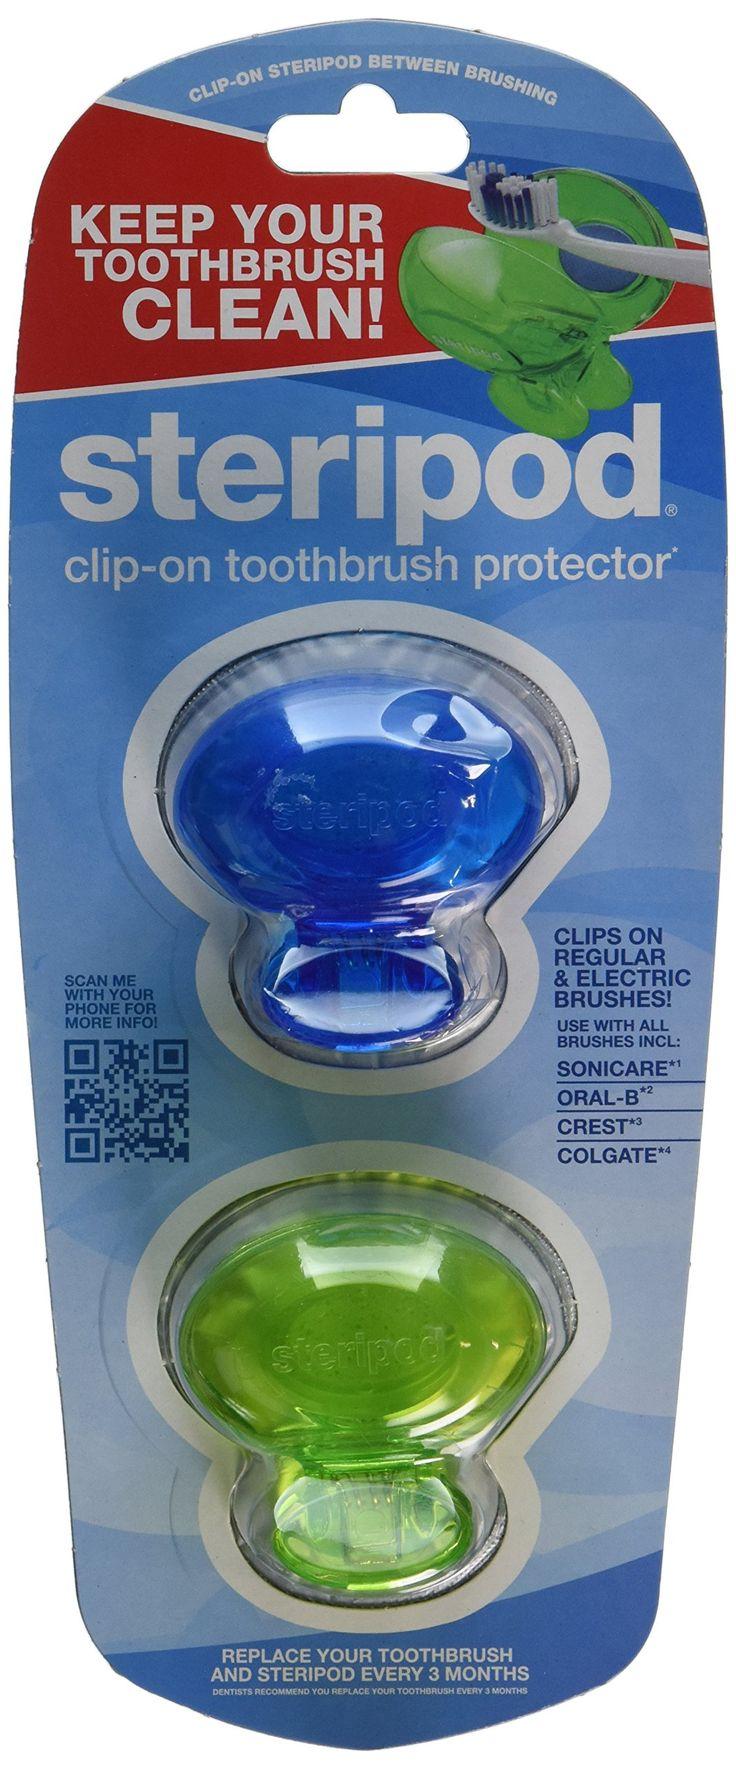 Steripod Clipon Toothbrush Sanitizer (2 Pack